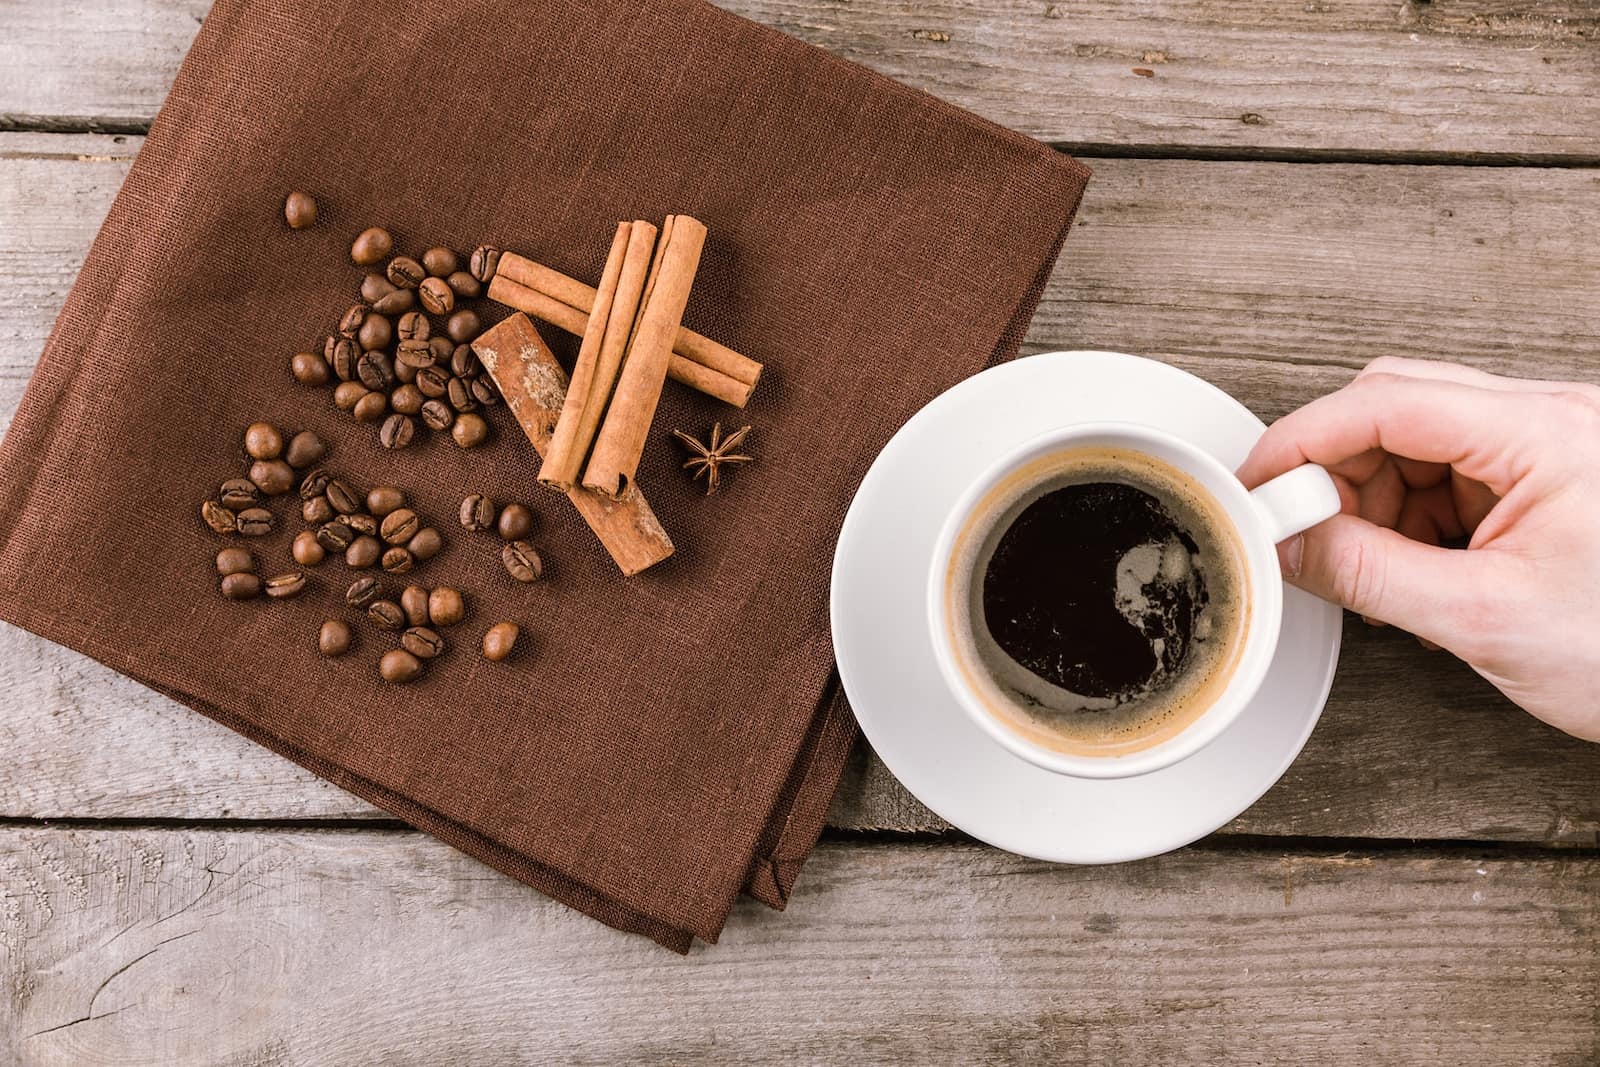 Cinnamon in coffee